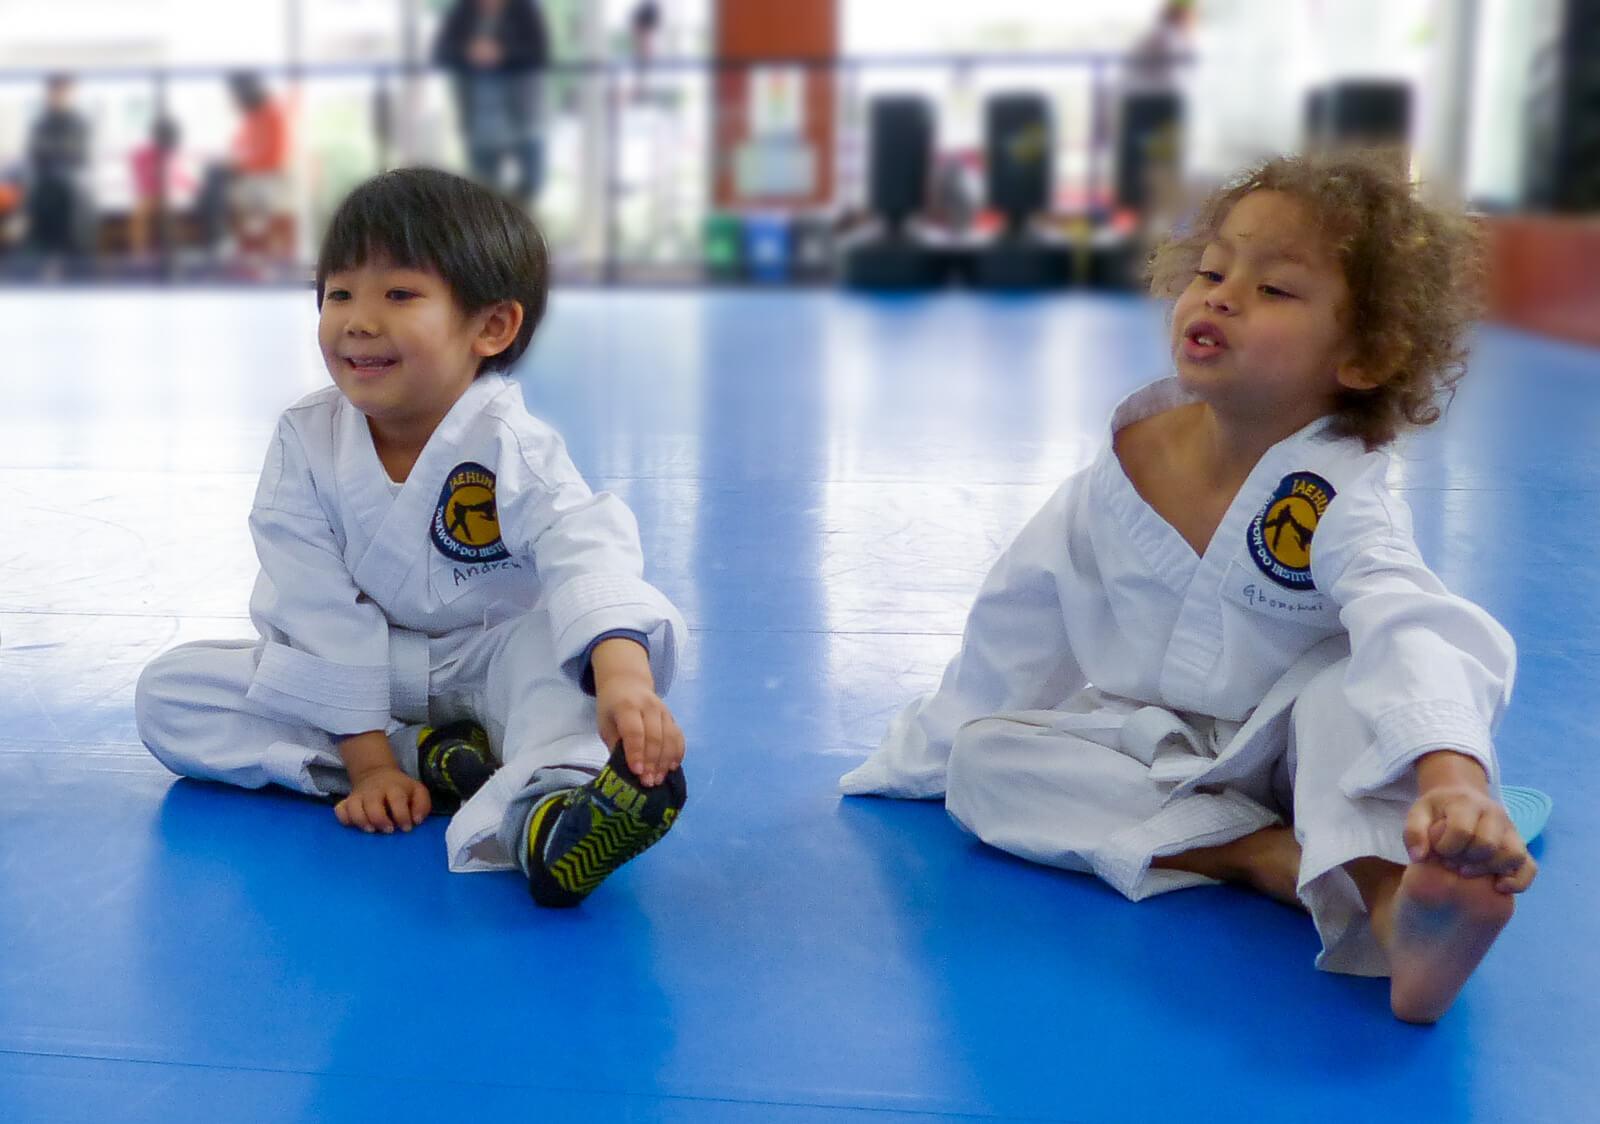 Focus, discipline, listening - skills taught in our martial arts classes for preschoolers